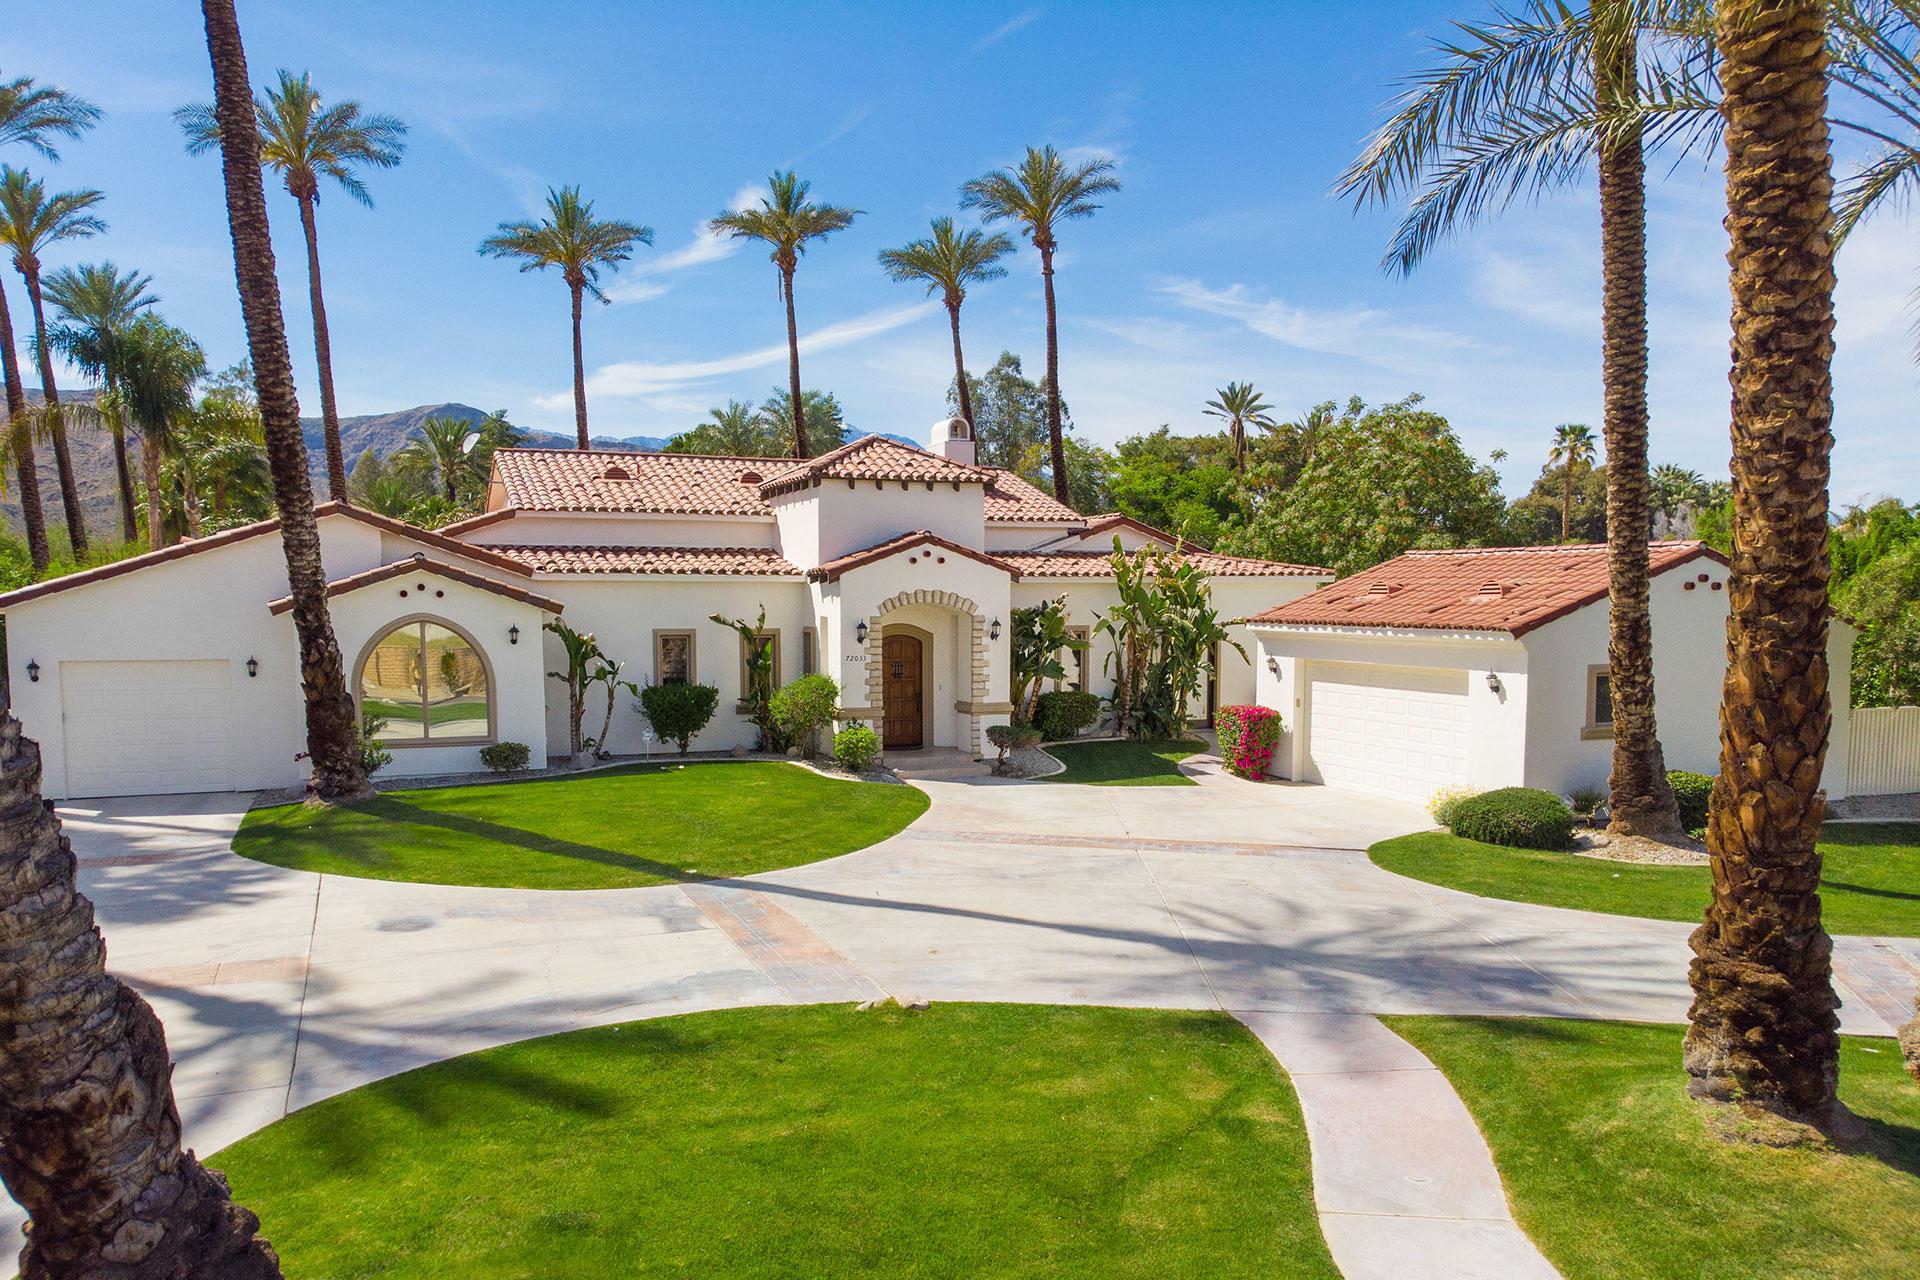 Photo of 72033 Clancy Lane, Rancho Mirage, CA 92270